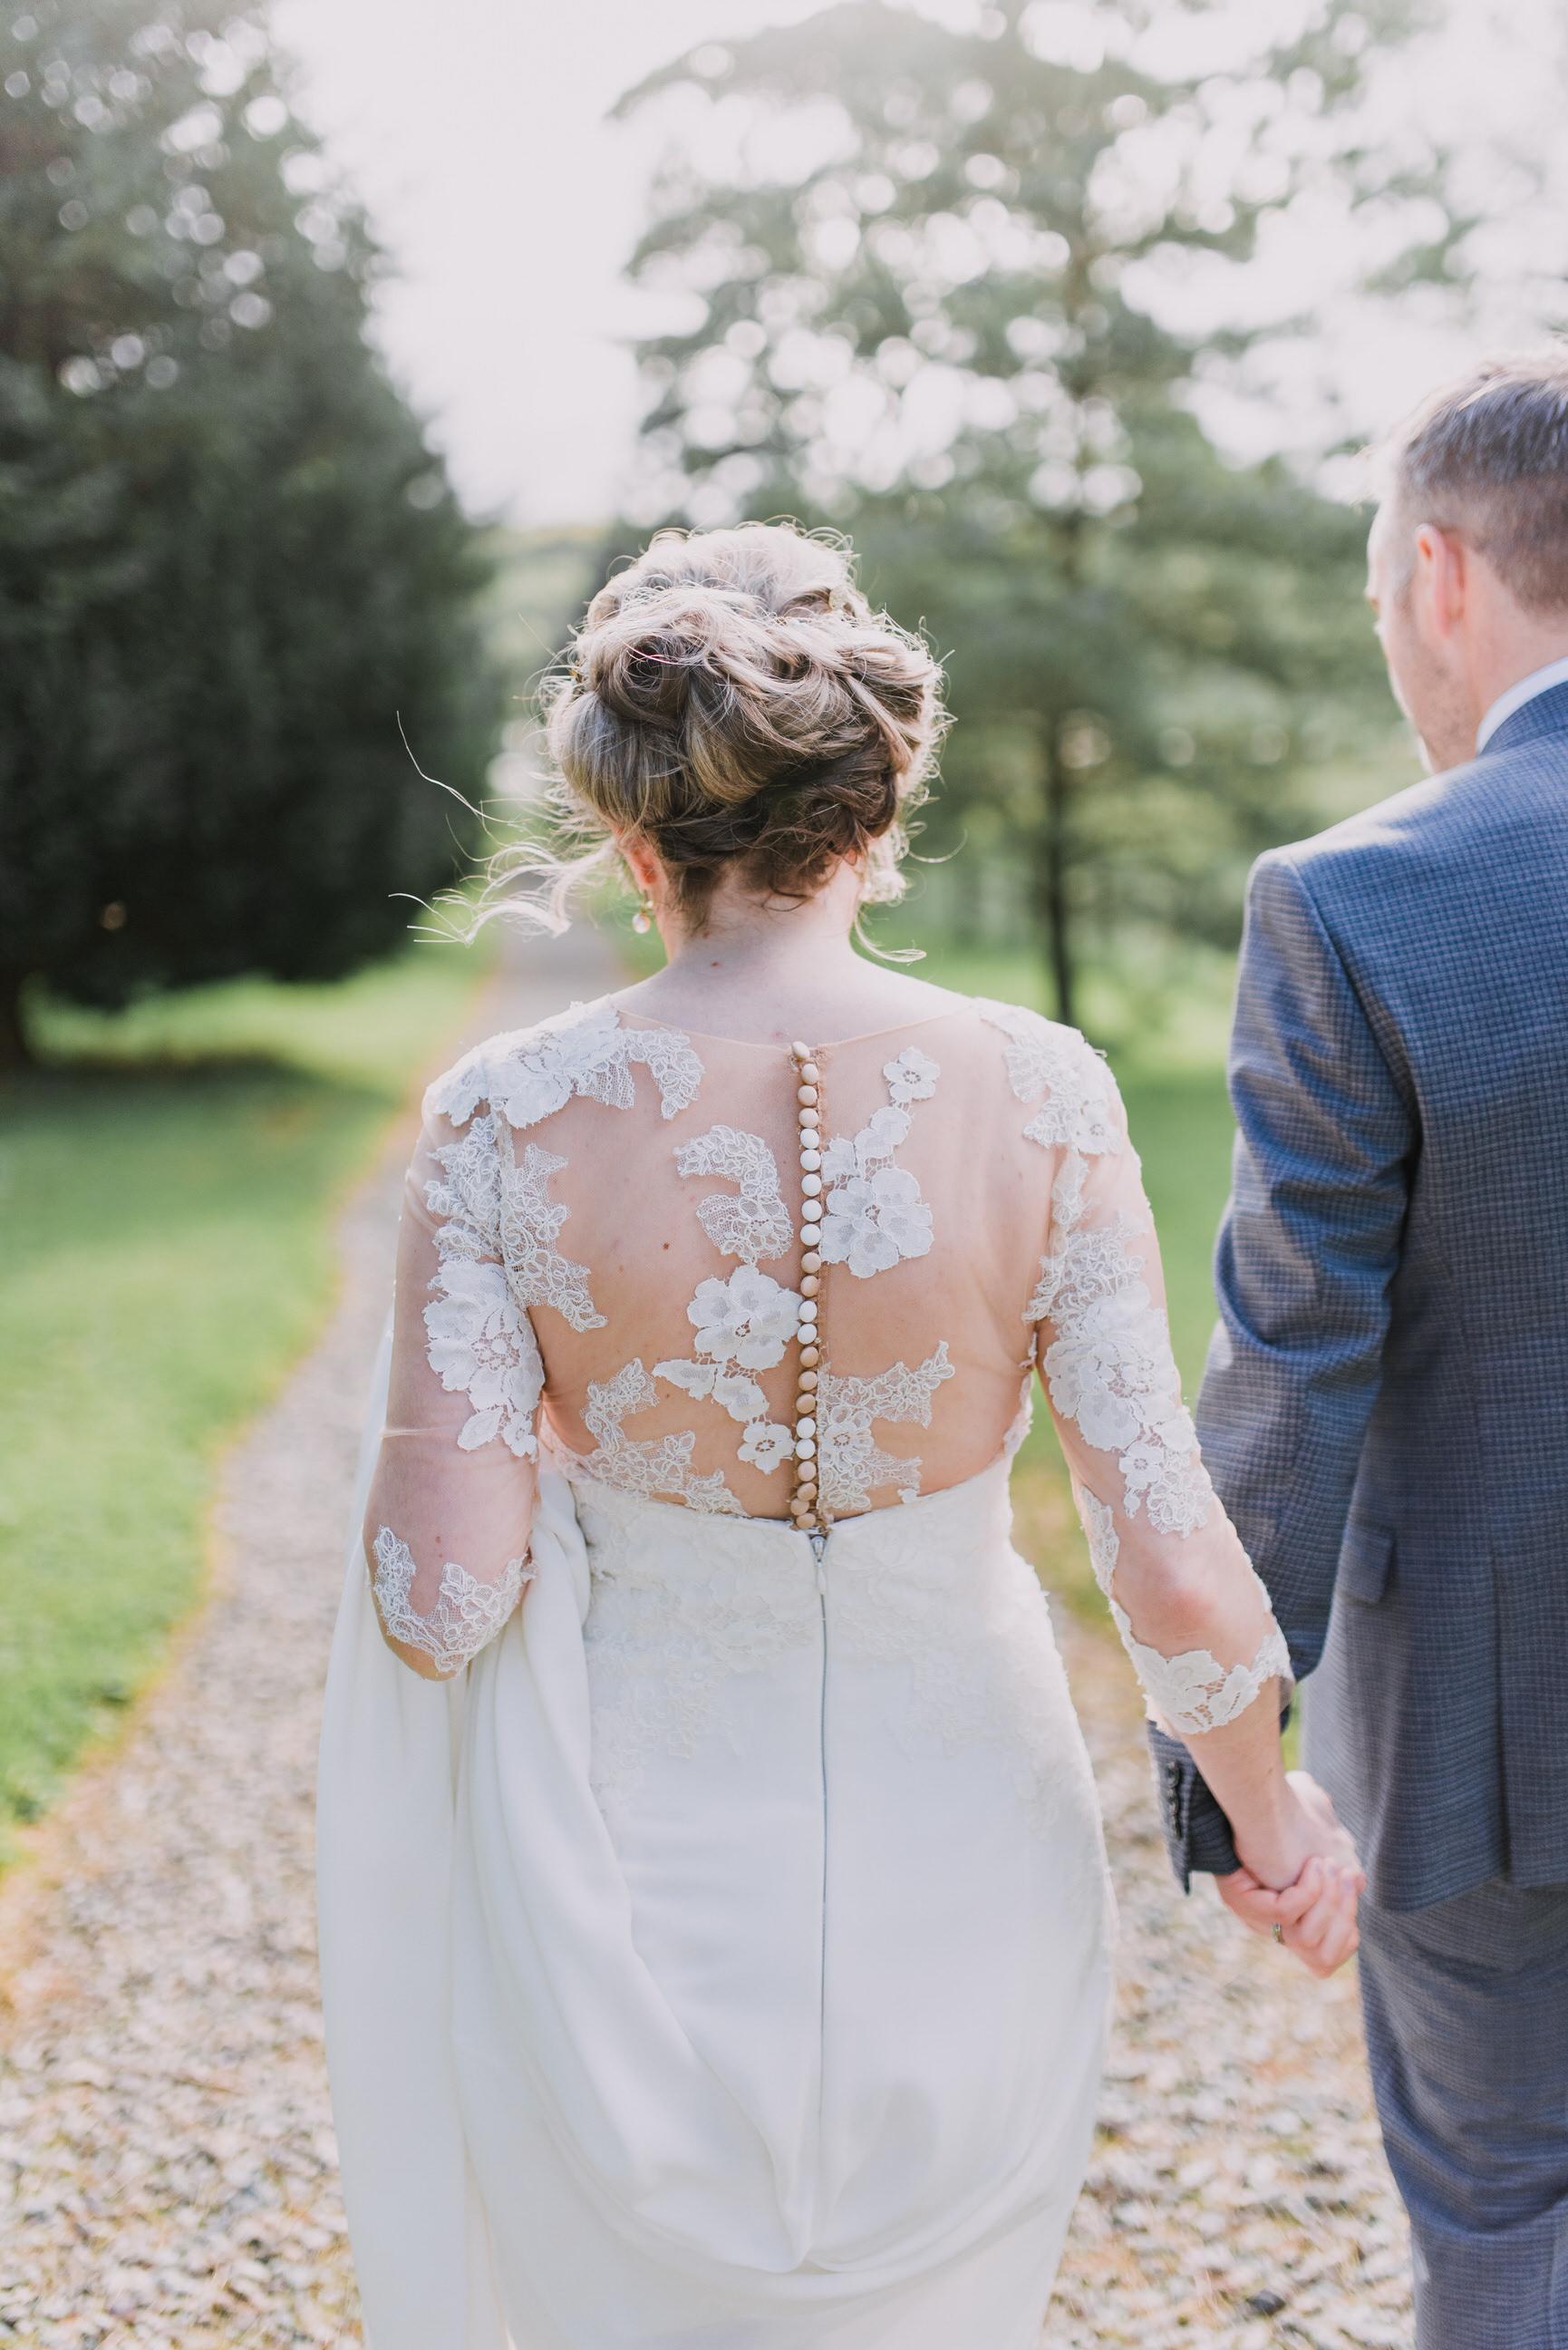 lissanoure castle wedding, northern ireland wedding photographer, romantic northern irish wedding venue, castle wedding ireland, natural wedding photography ni (83).jpg